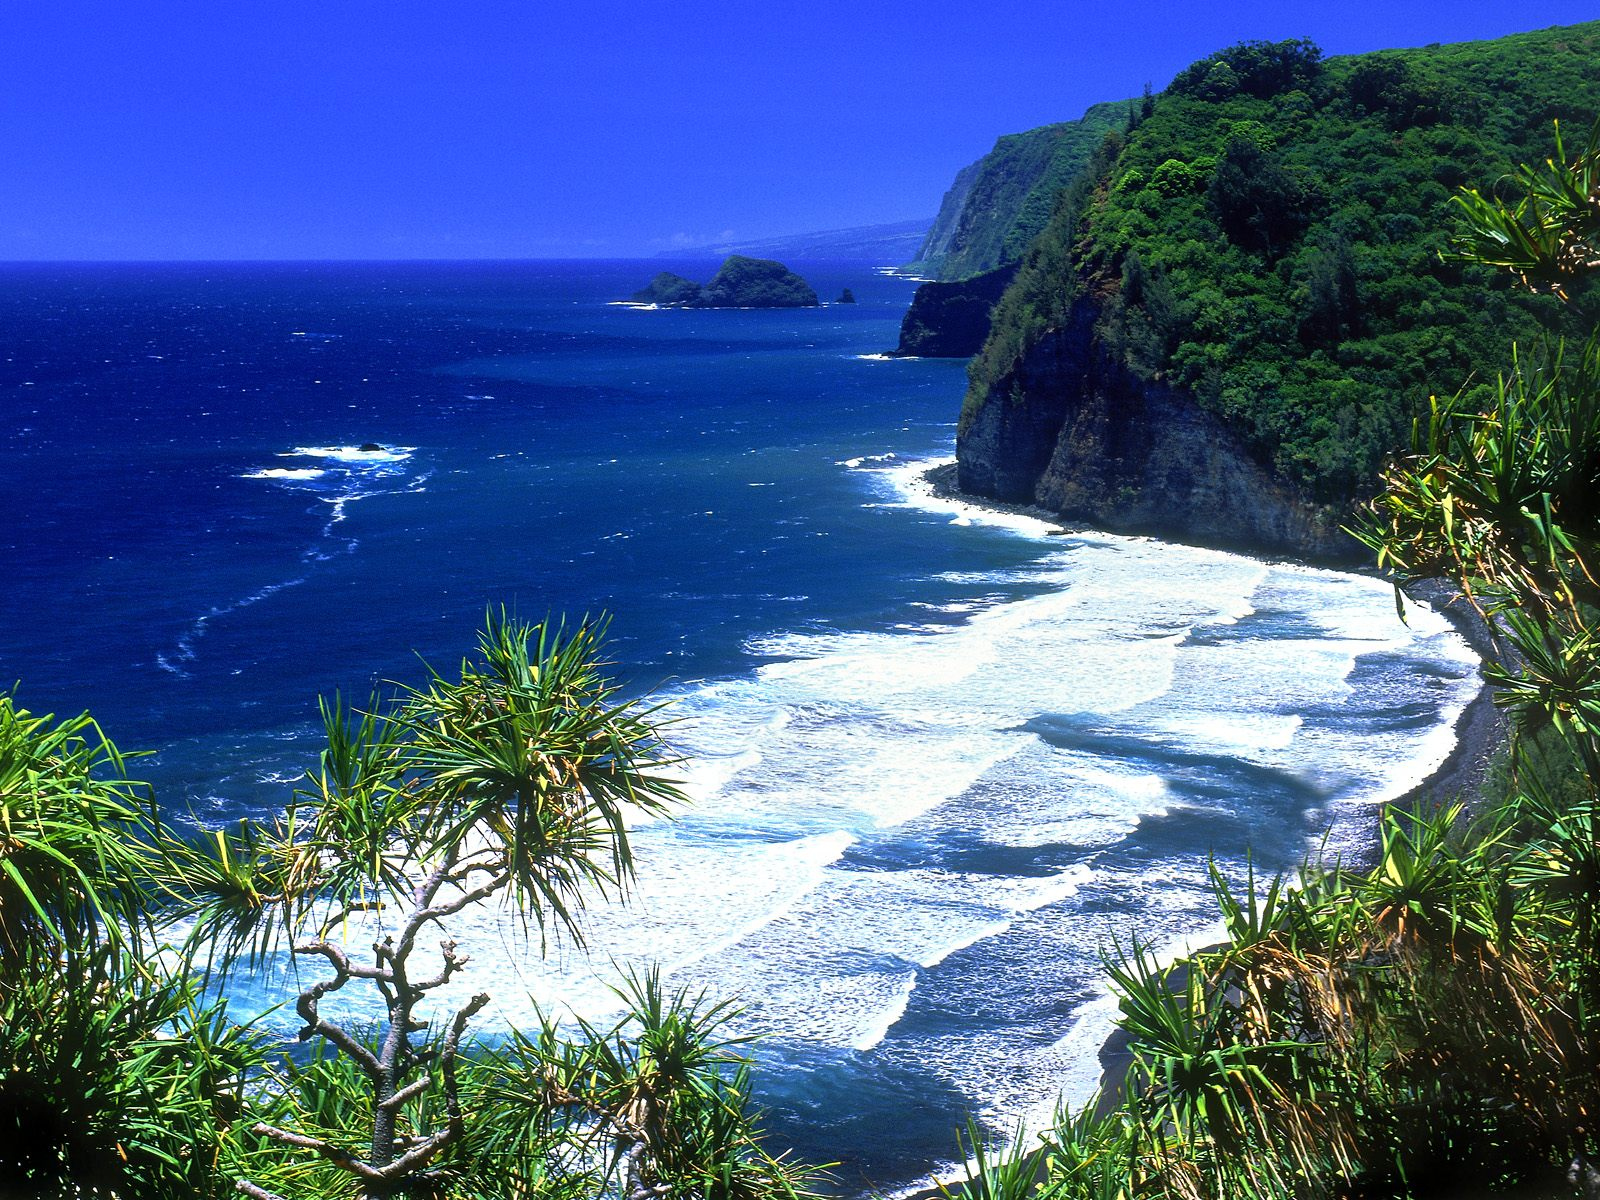 wallpaper hawaii beache hawaii beache hawaii beache hawaii beache ...